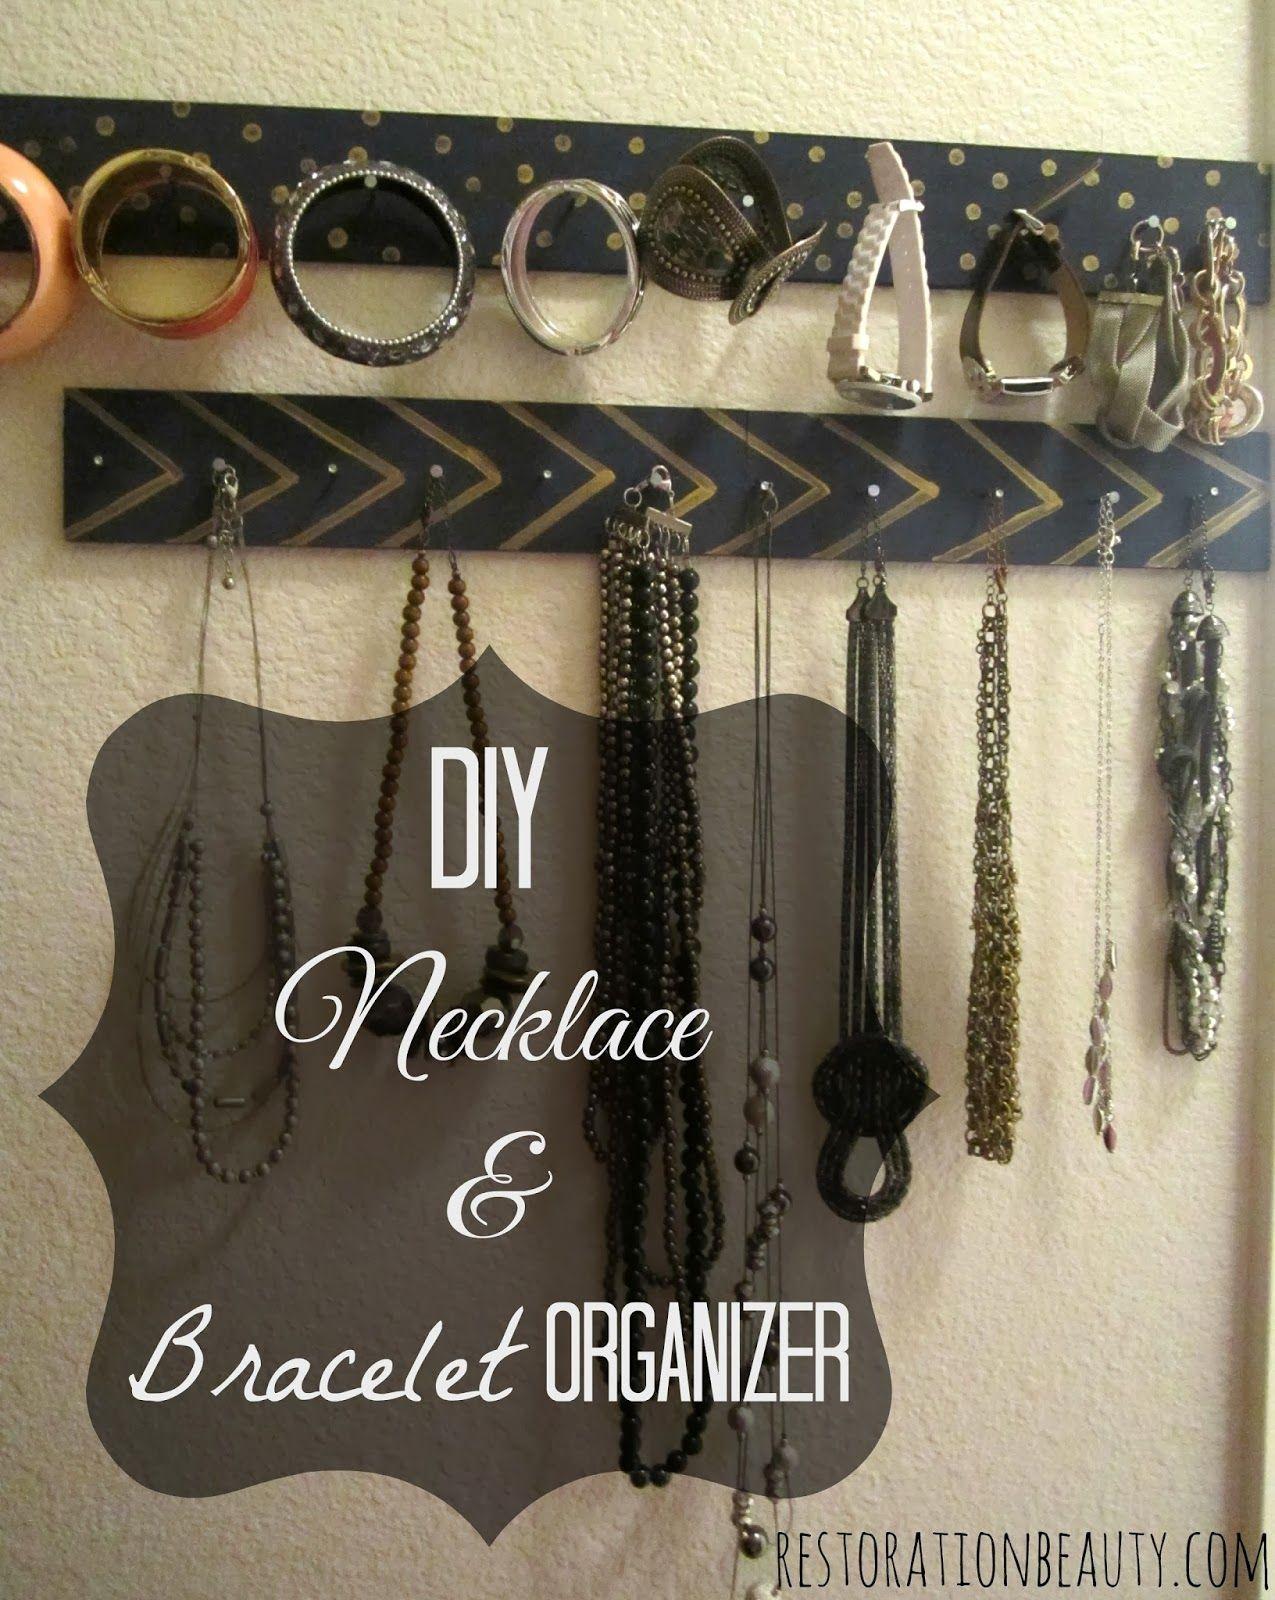 Diy necklace bracelet organizer collane riciclo e - Porta collane ikea ...